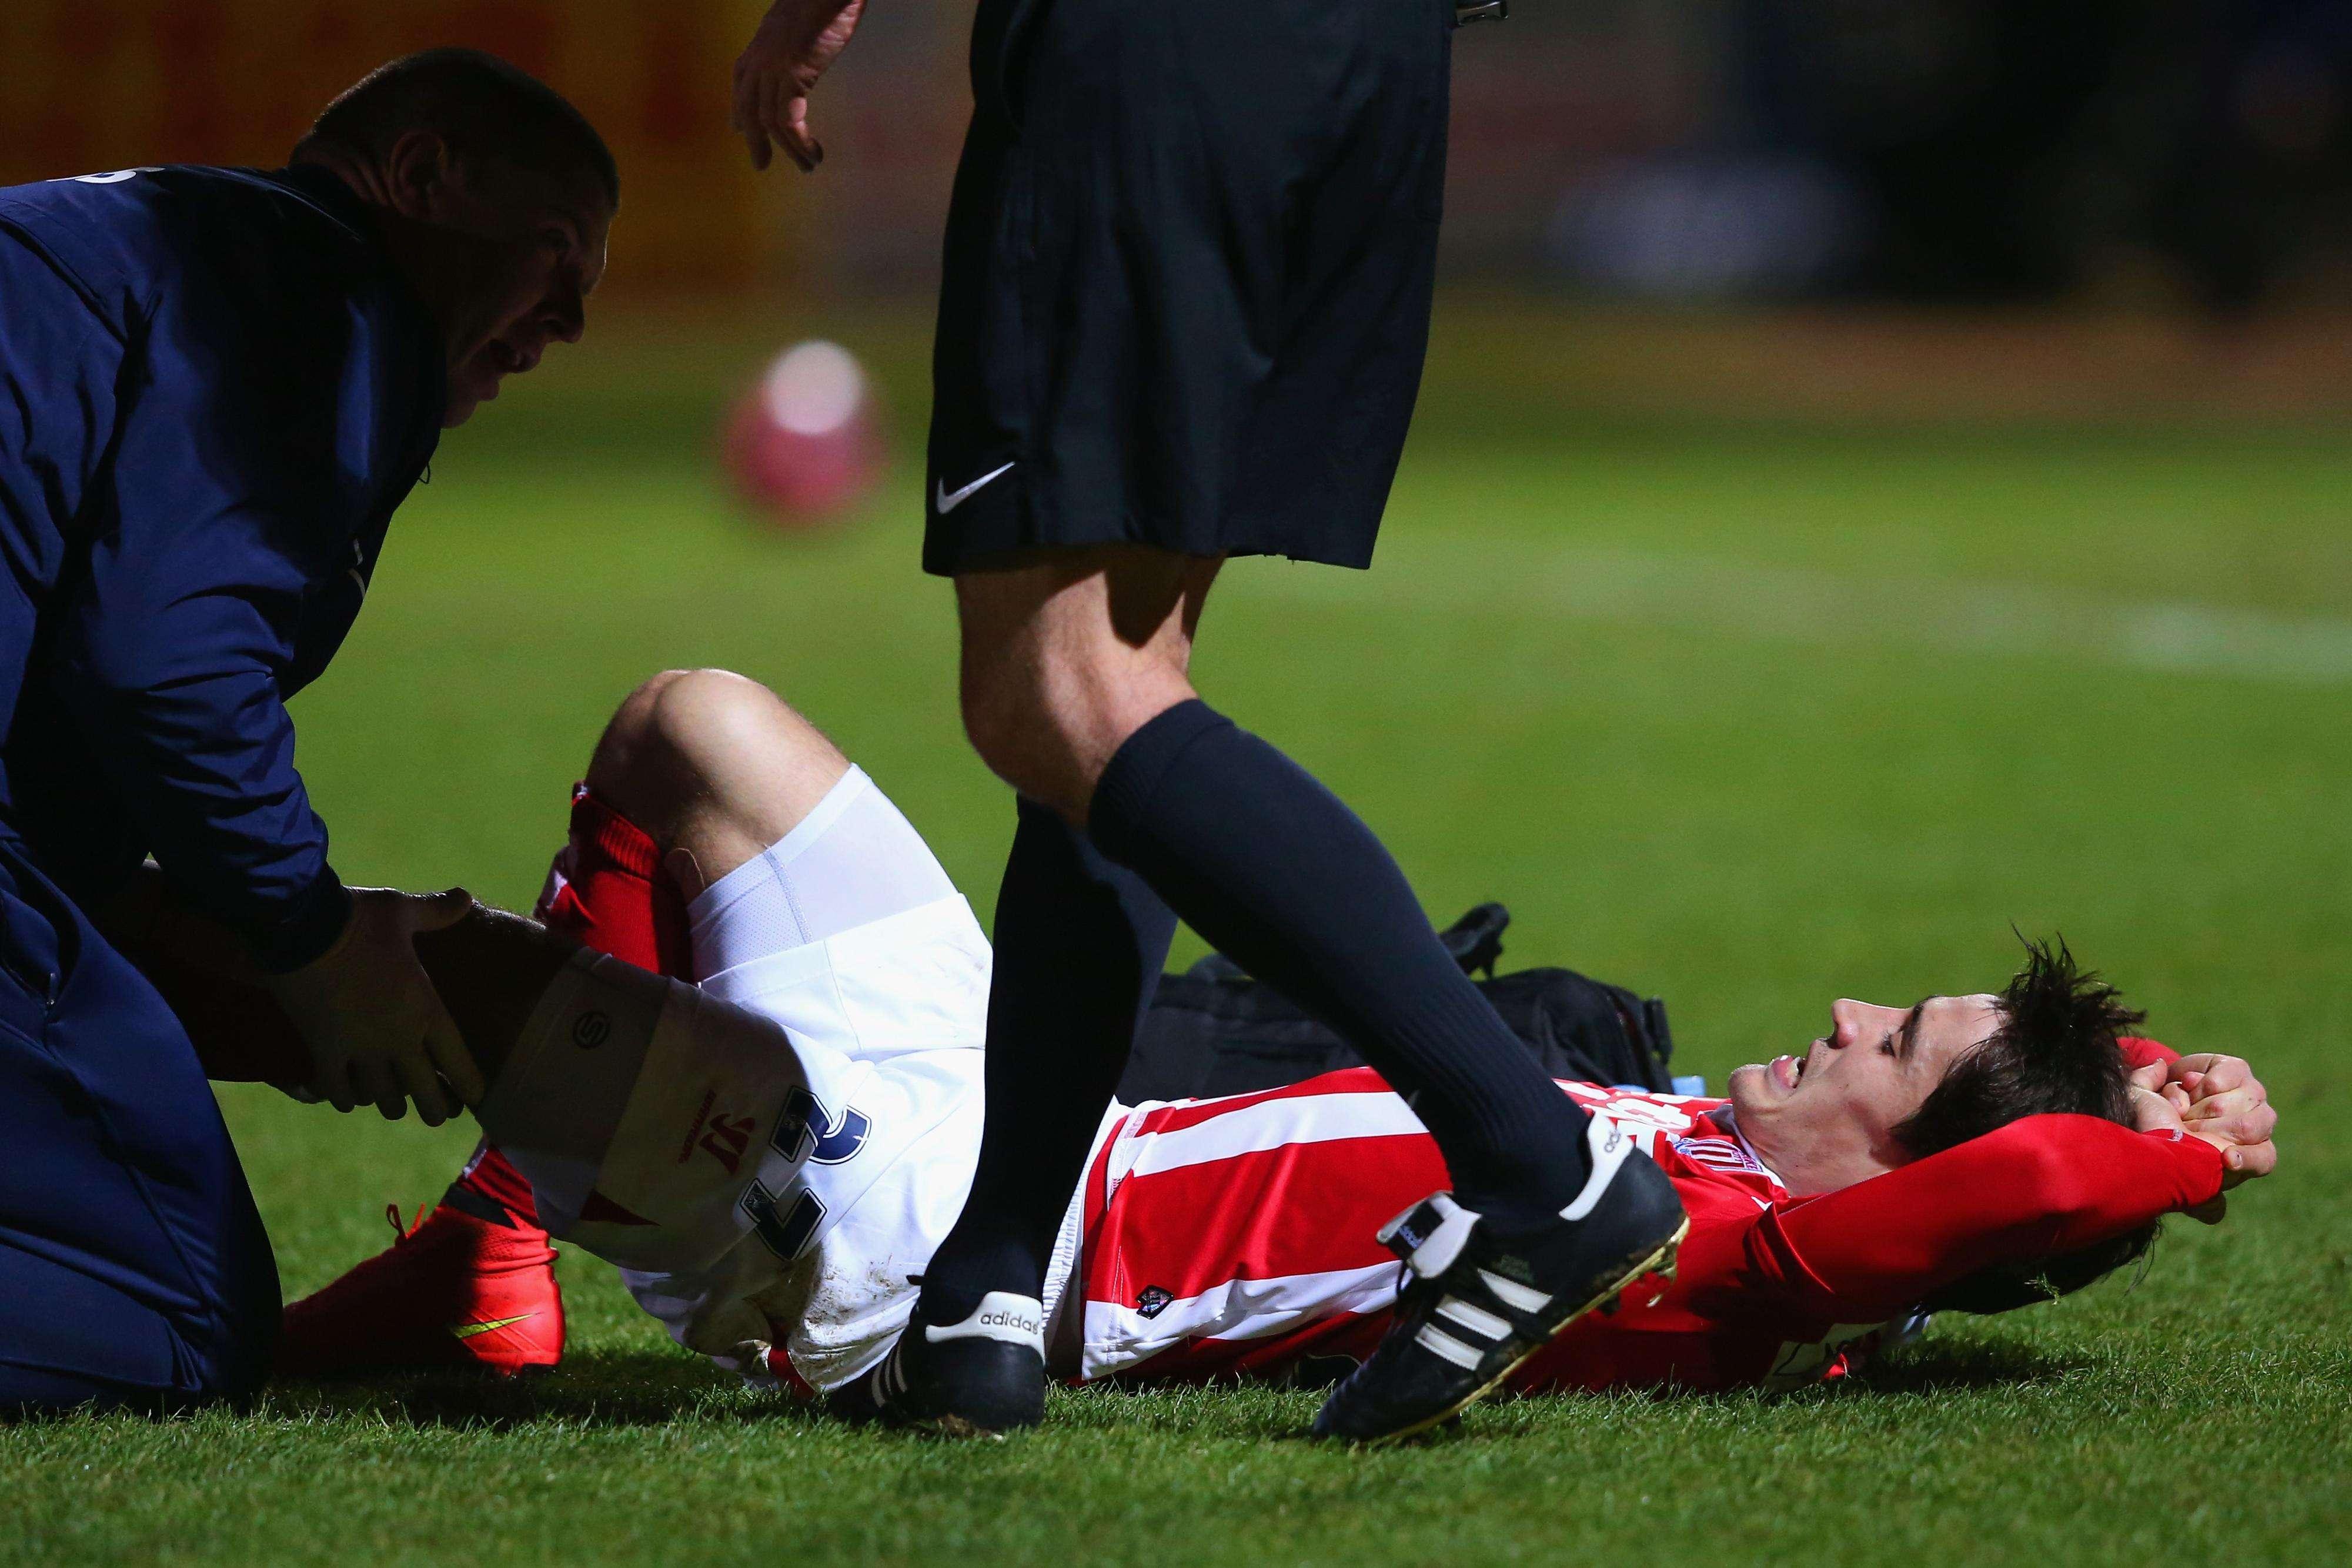 El español se lesionó la rodilla. Foto: Getty Images